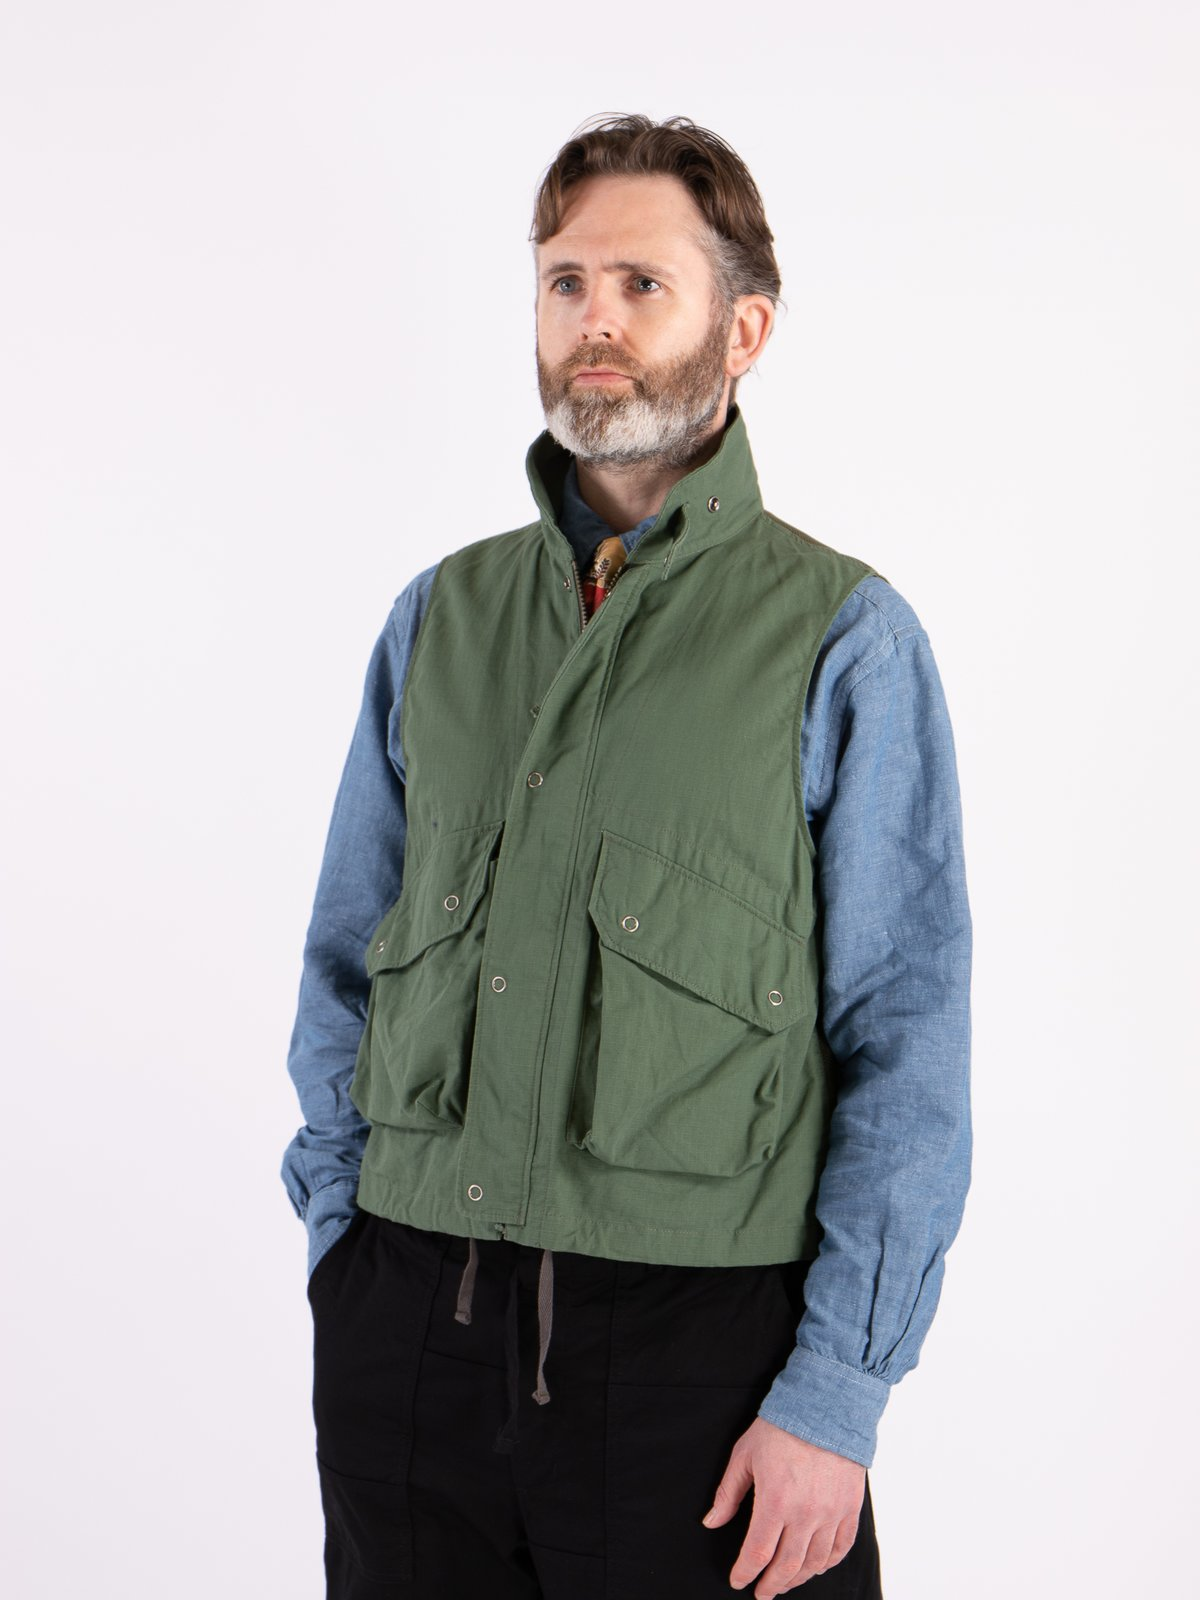 Olive Cotton Ripstop Field Vest - Image 2